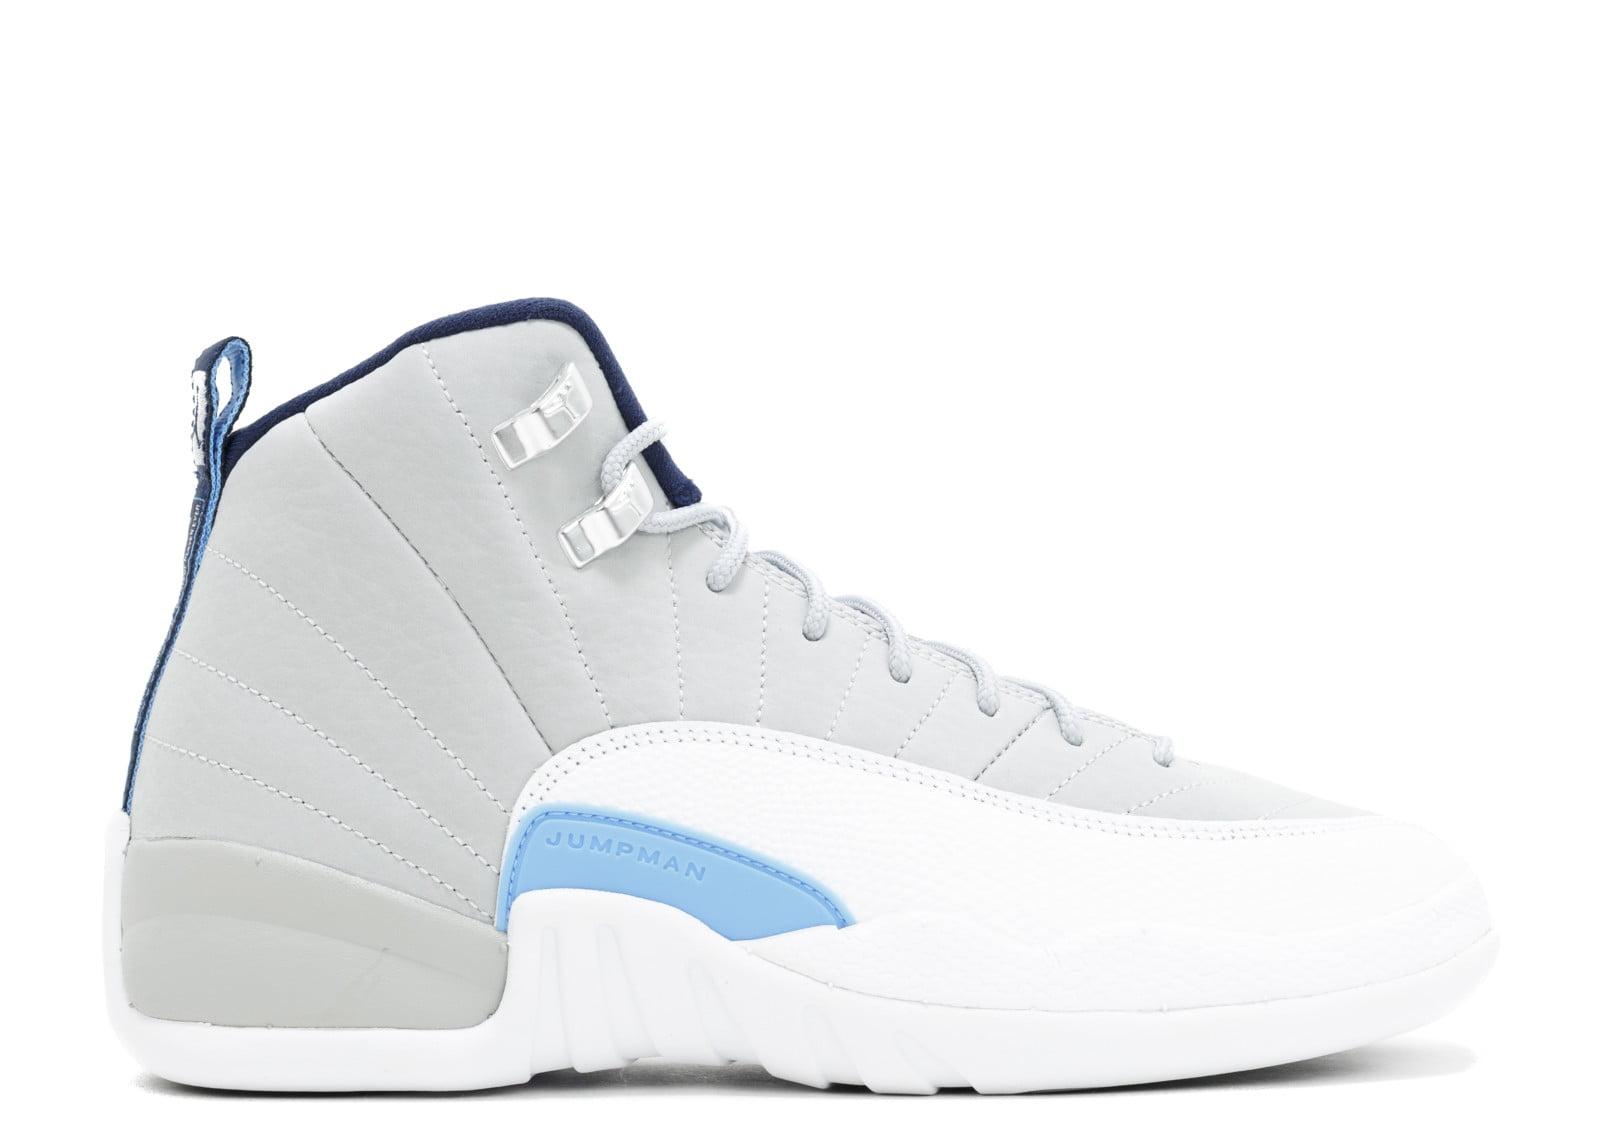 Air Jordan Retro 12 XII UNC Grey White